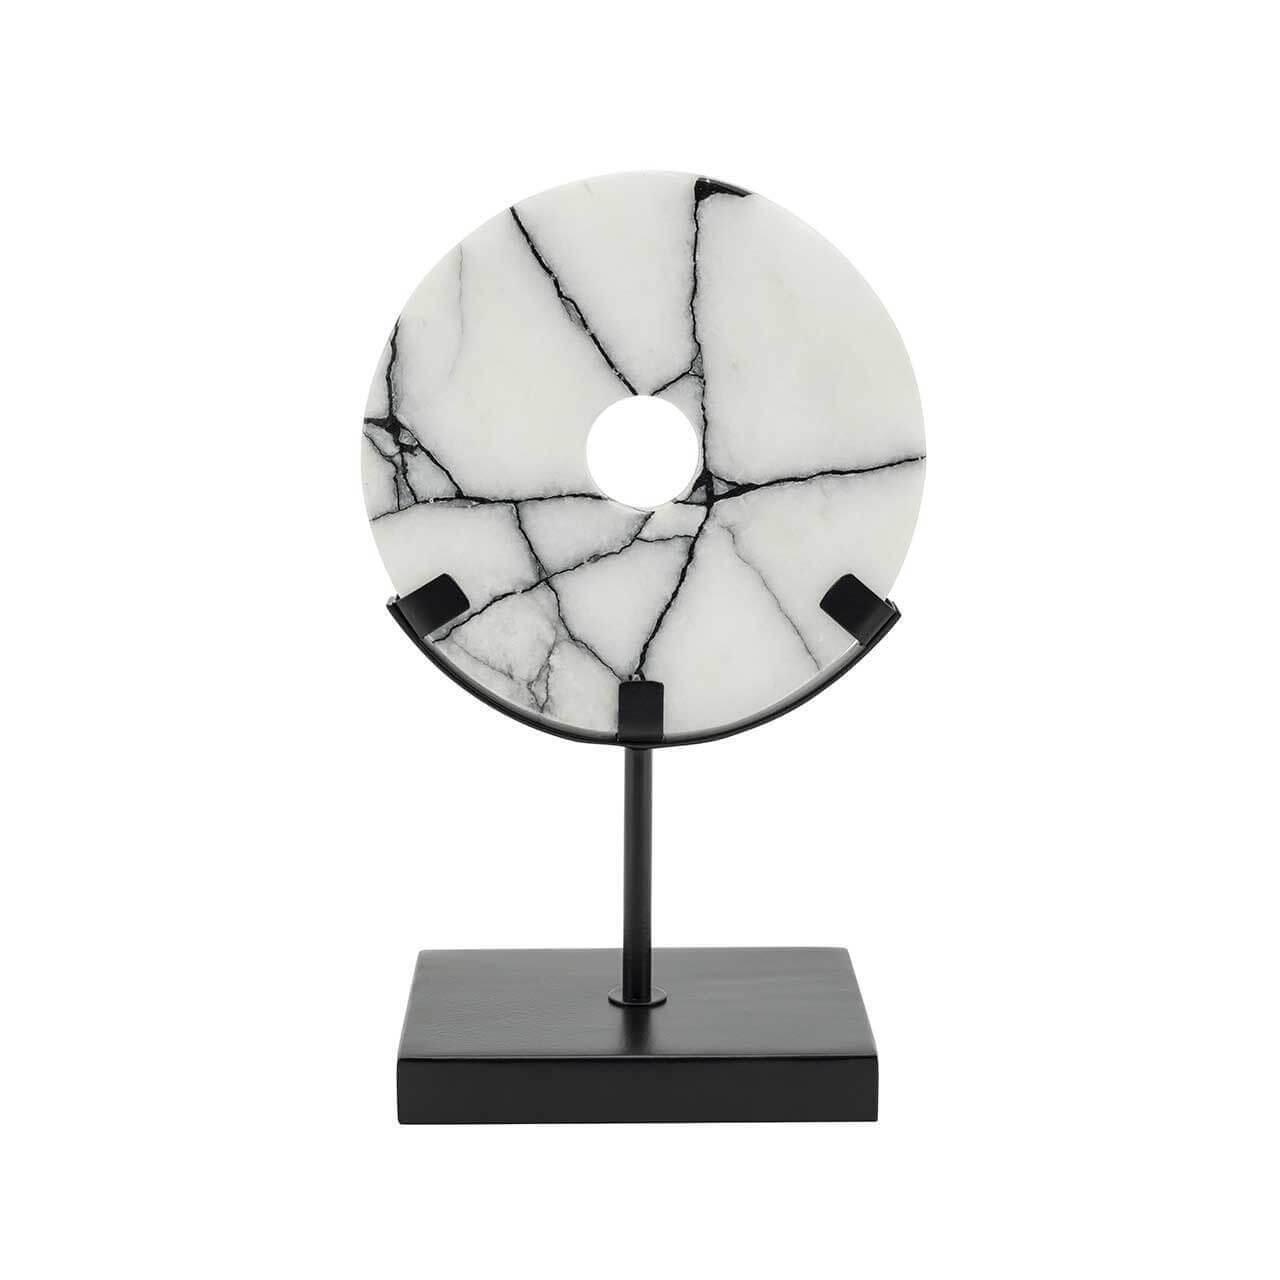 ABHIKA Disk Madison+Stand SM, H25 15,5x9,5 Black/White